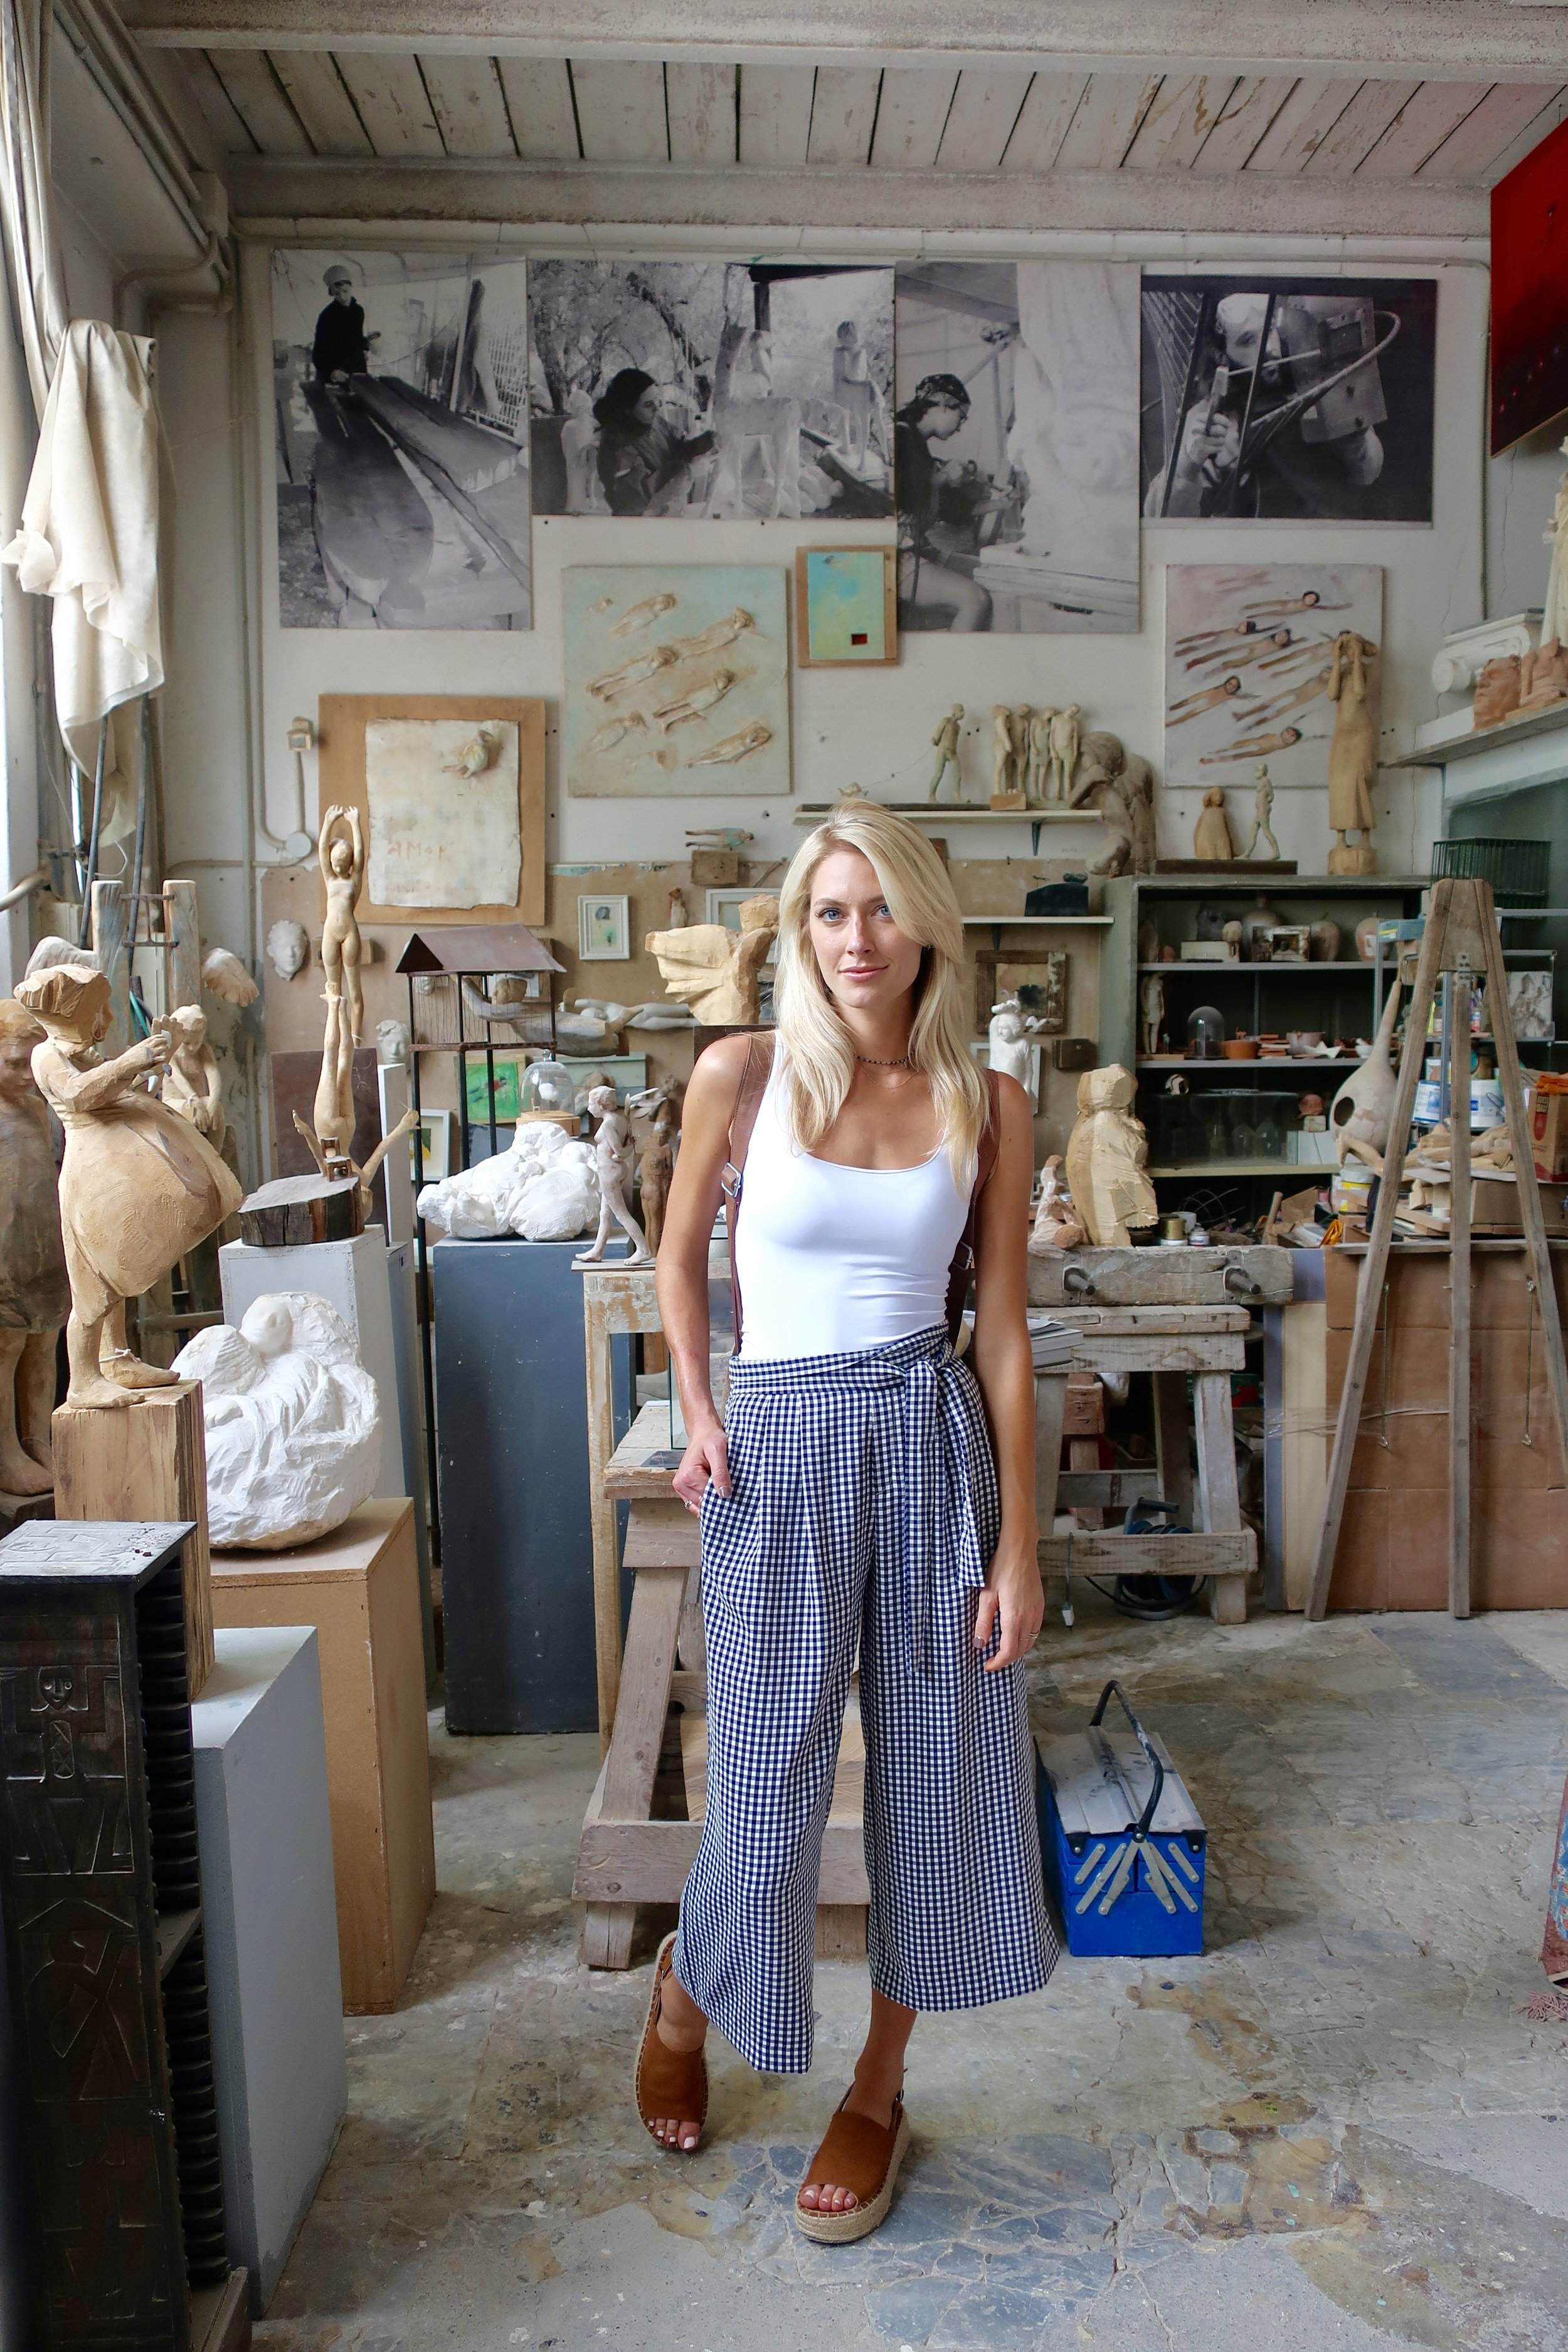 artist's studio in italy